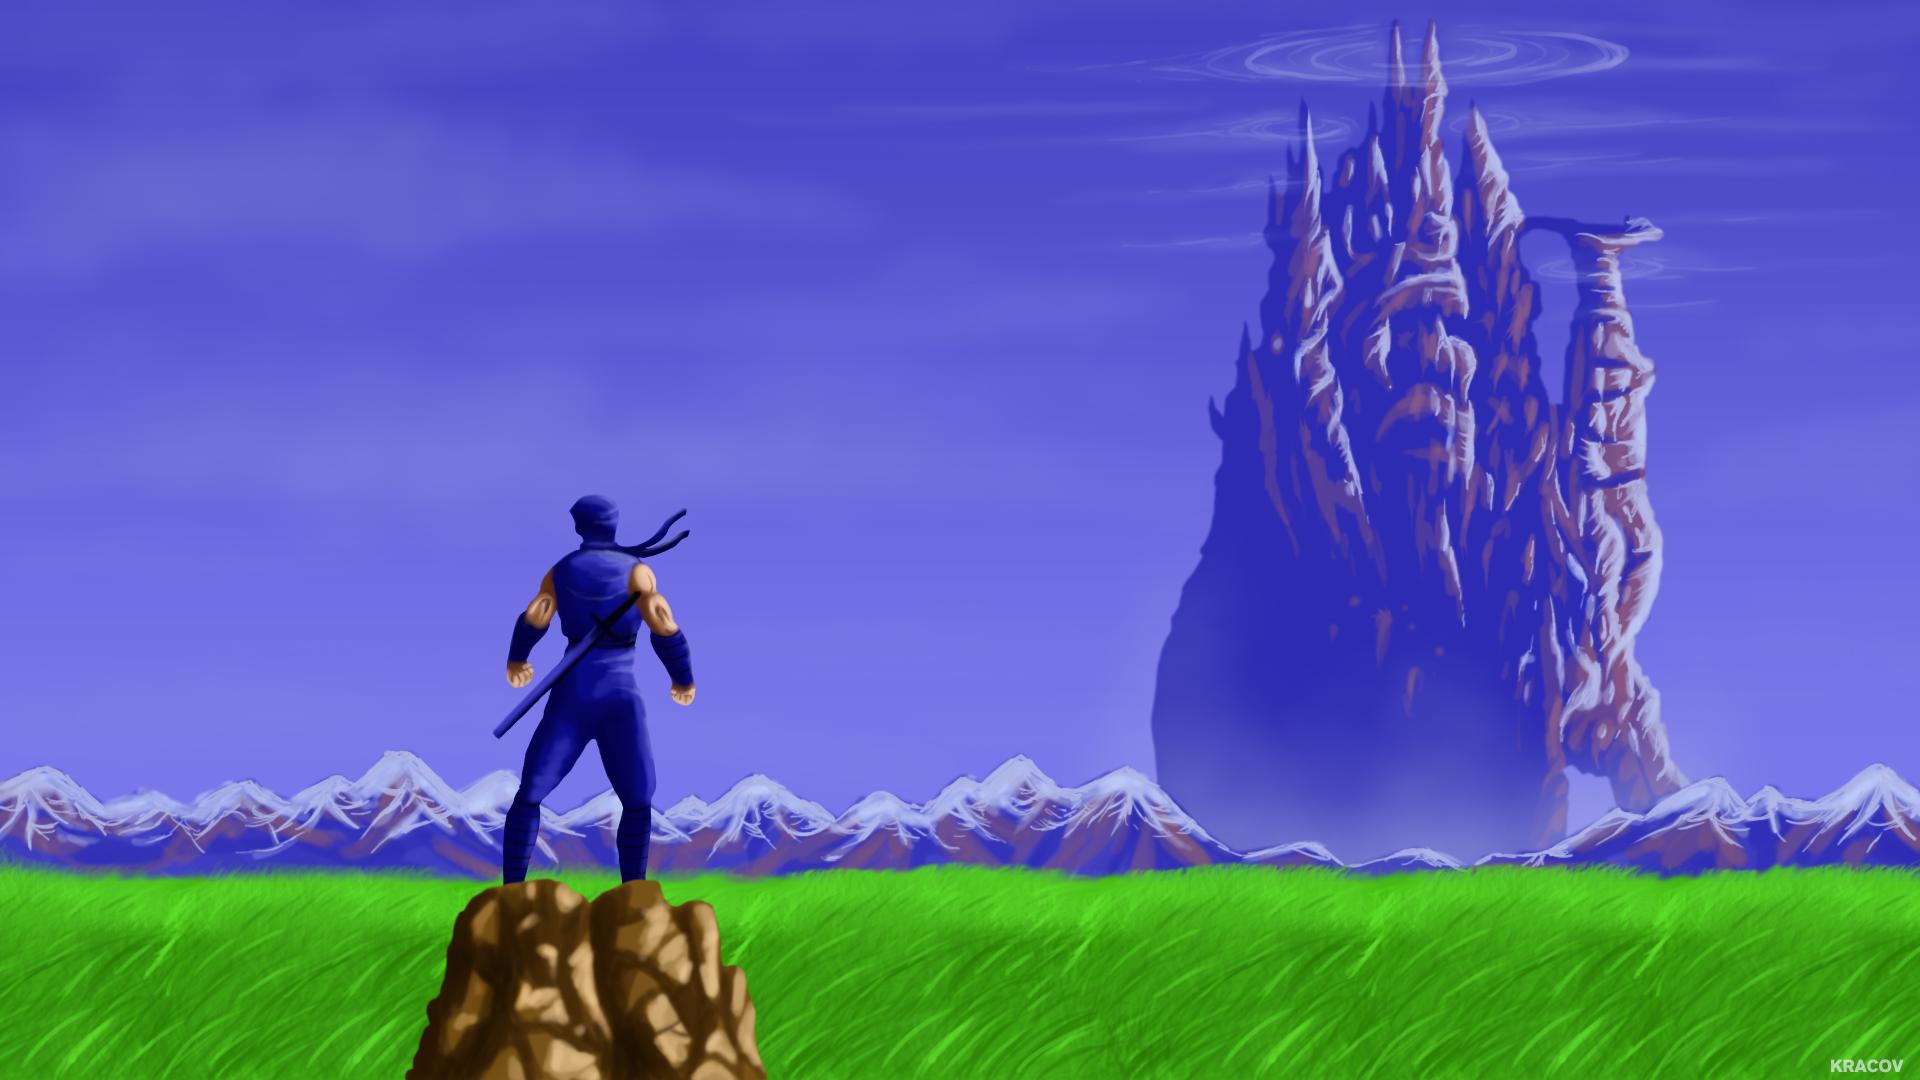 Ninja Gaiden Hd By Kracov On Deviantart